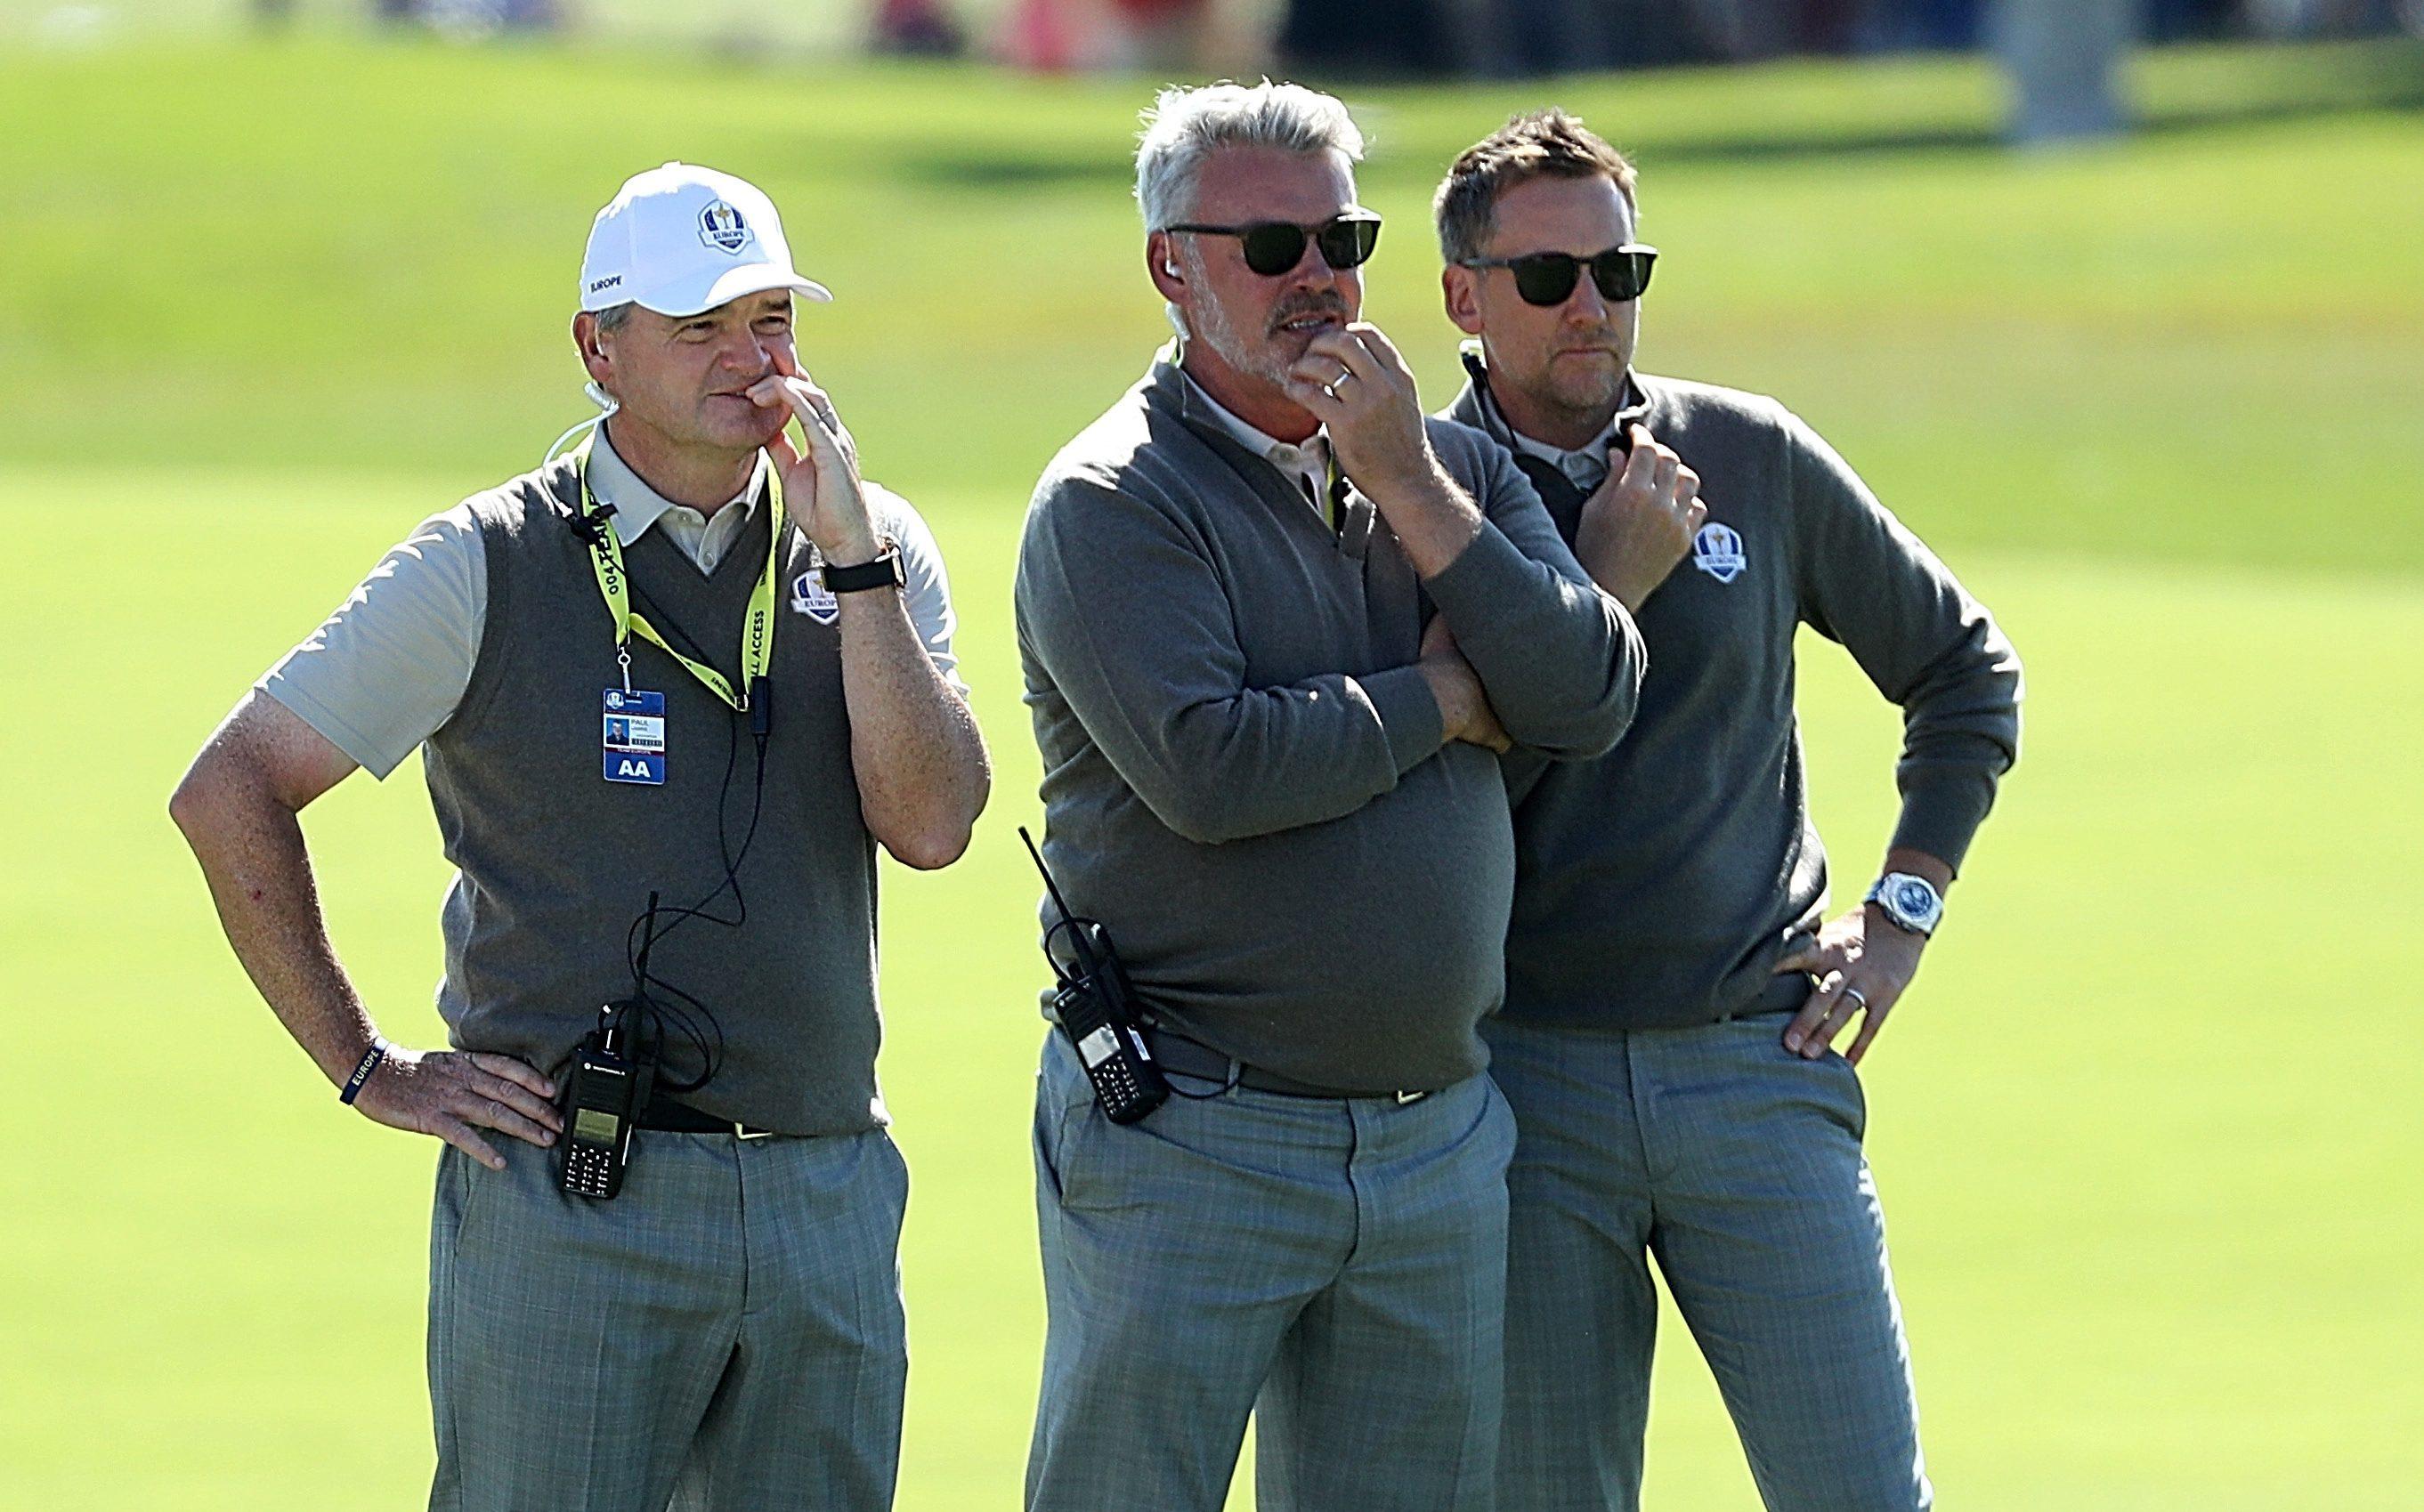 Darren Clarke (centre) with vice-captains Paul Lawrie and Ian Poulter at Hazeltine.